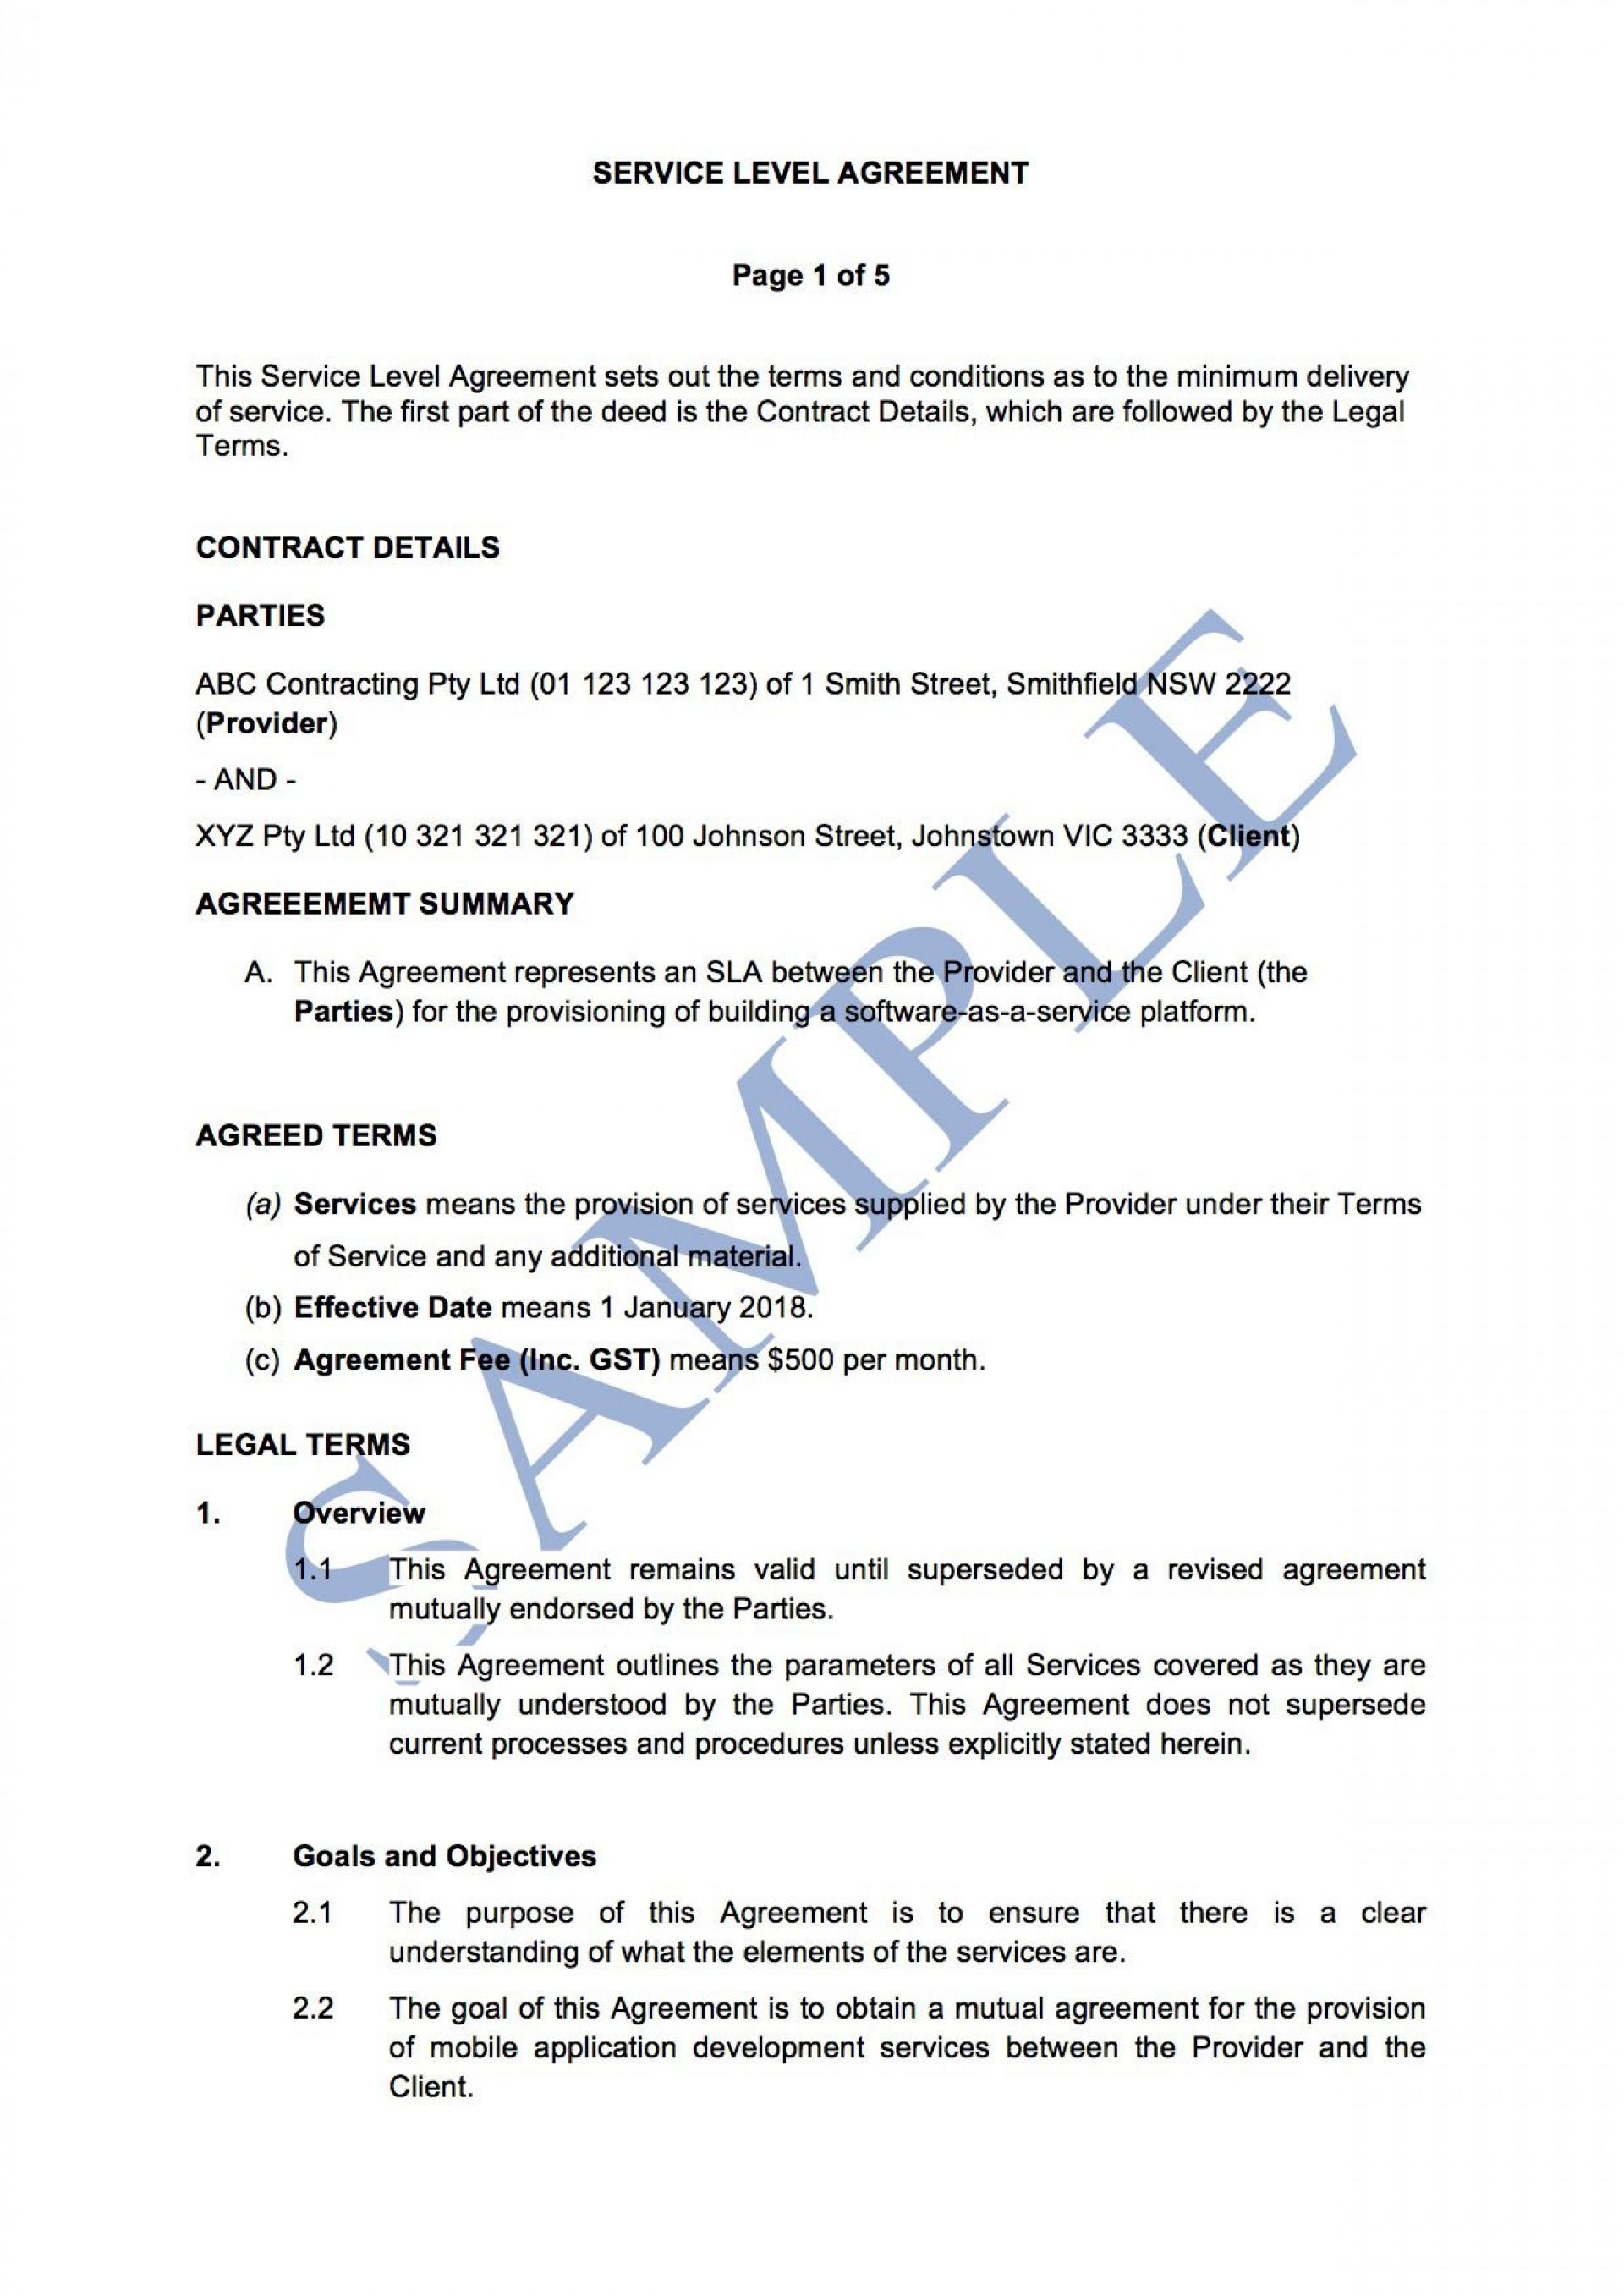 006 Best Service Level Agreement Template Concept  South Africa Nz For Website Development1920